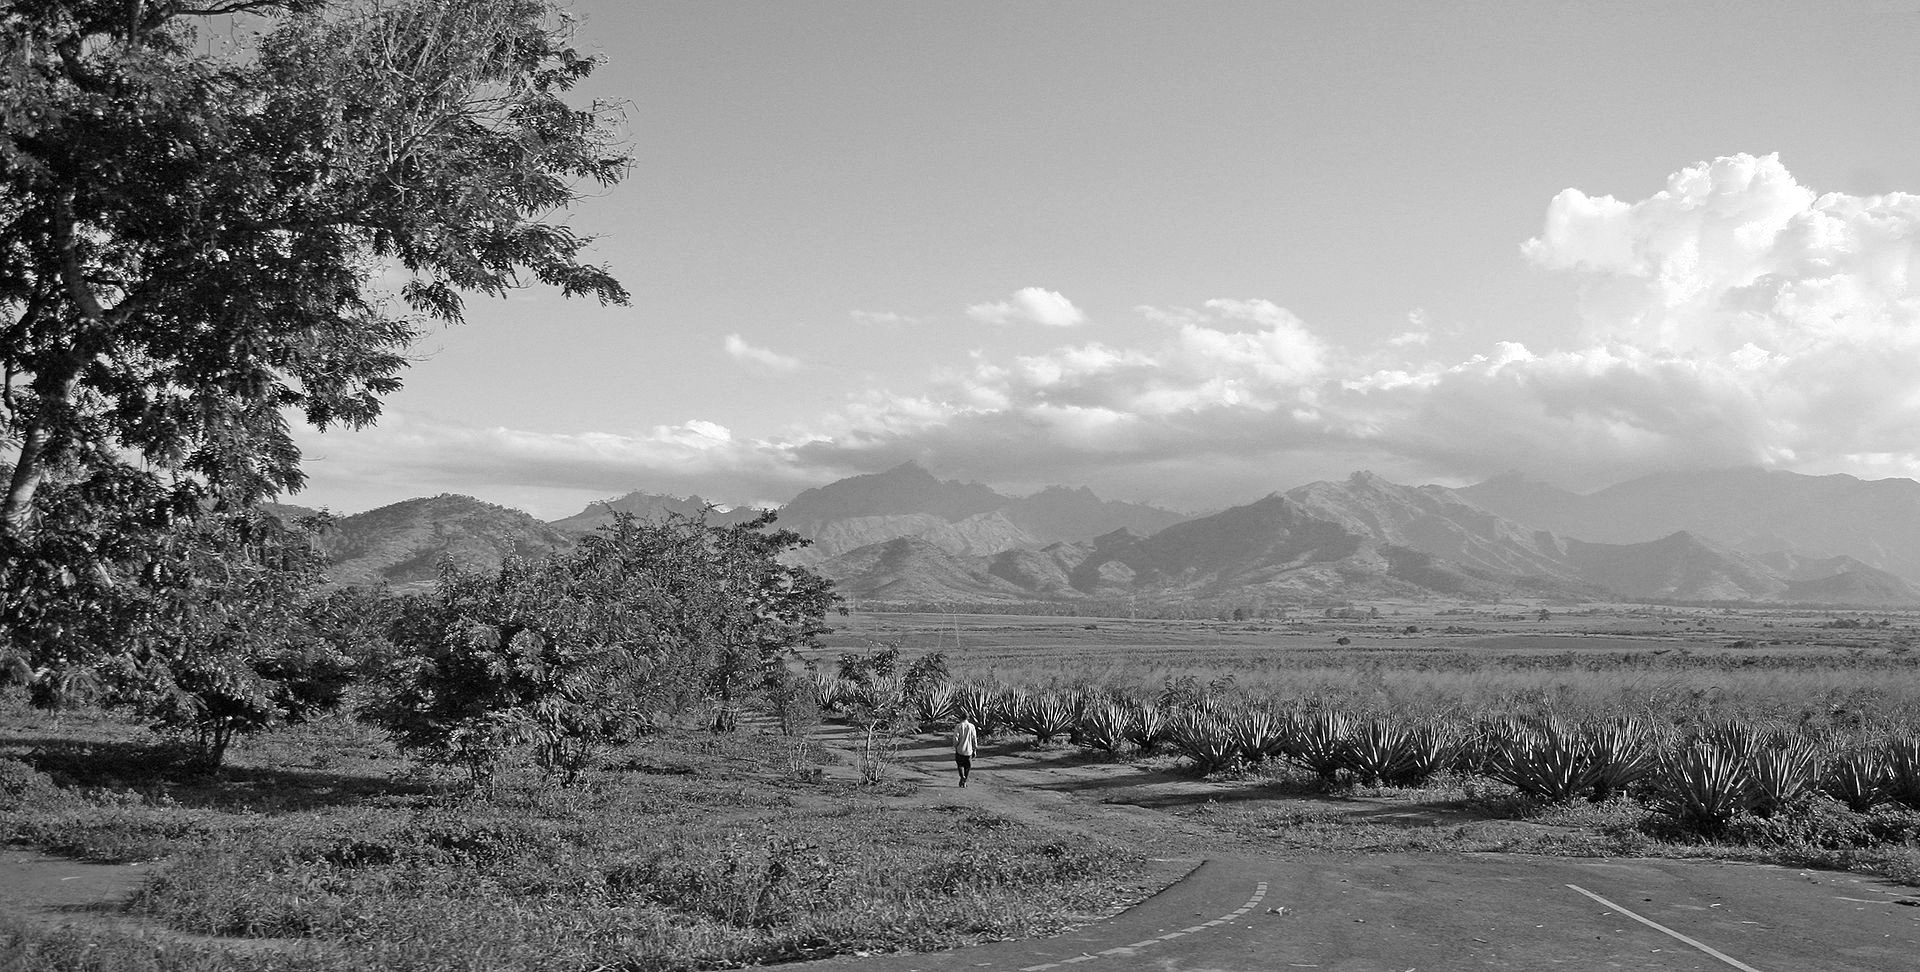 Sisal plantations surrounding Uluguru mountains